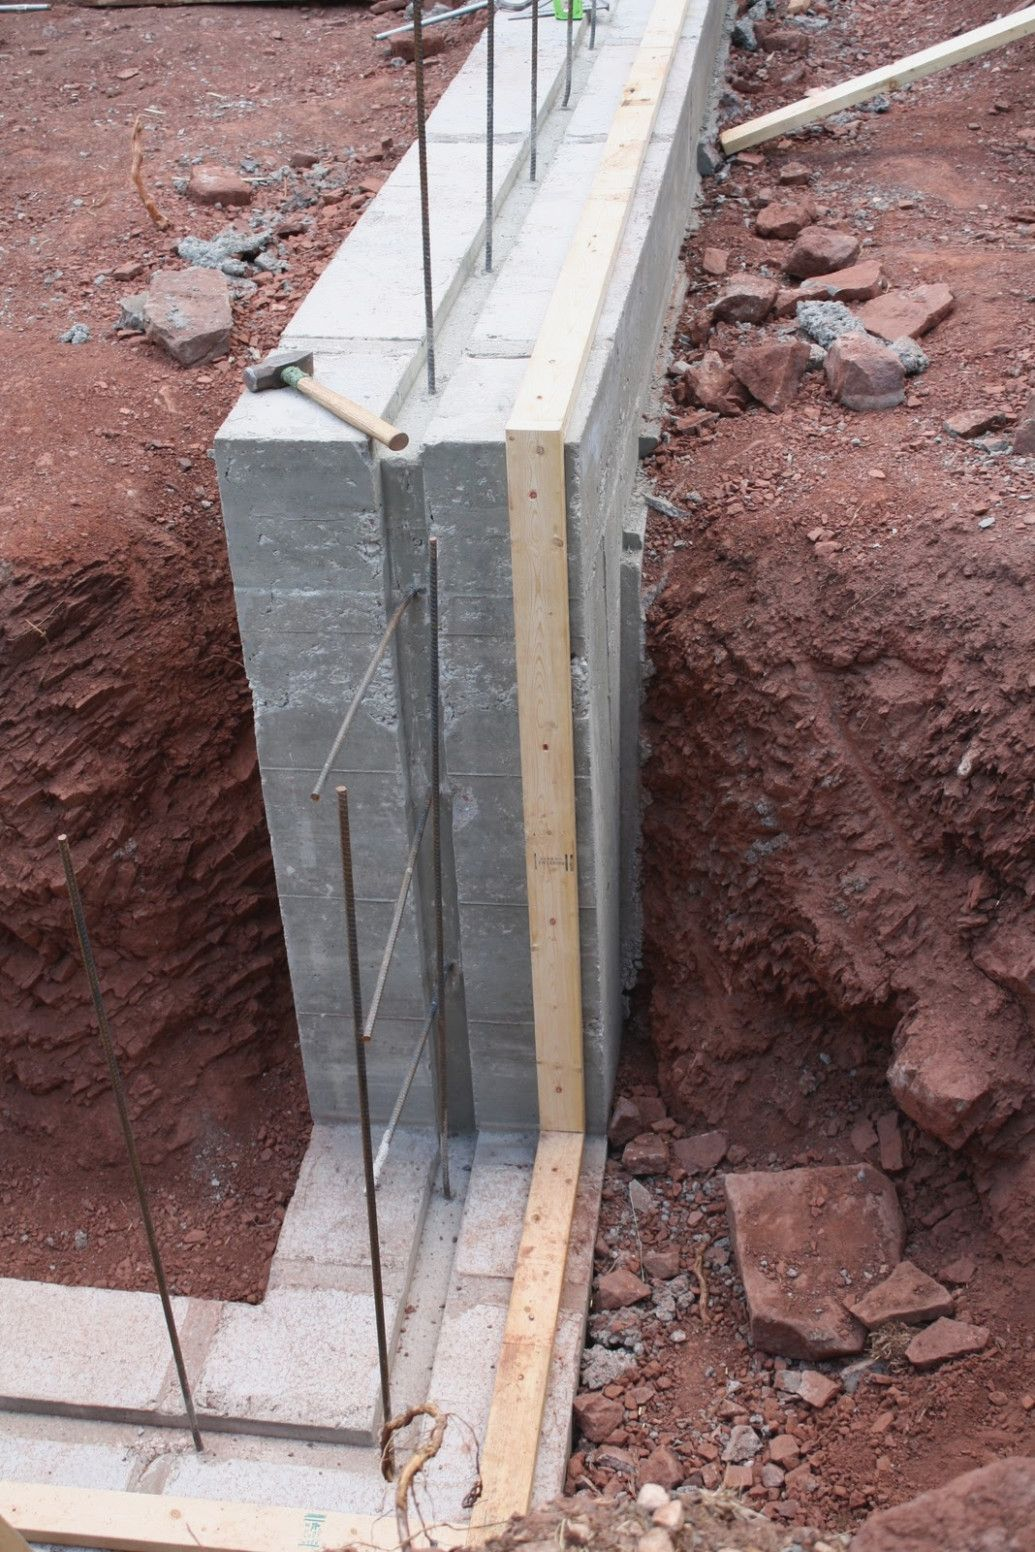 Concrete Wall Form Ties 14 14 8414 Am Impression Therefore Drilling In 2020 Concrete Wall Insulated Concrete Forms Concrete Block Walls